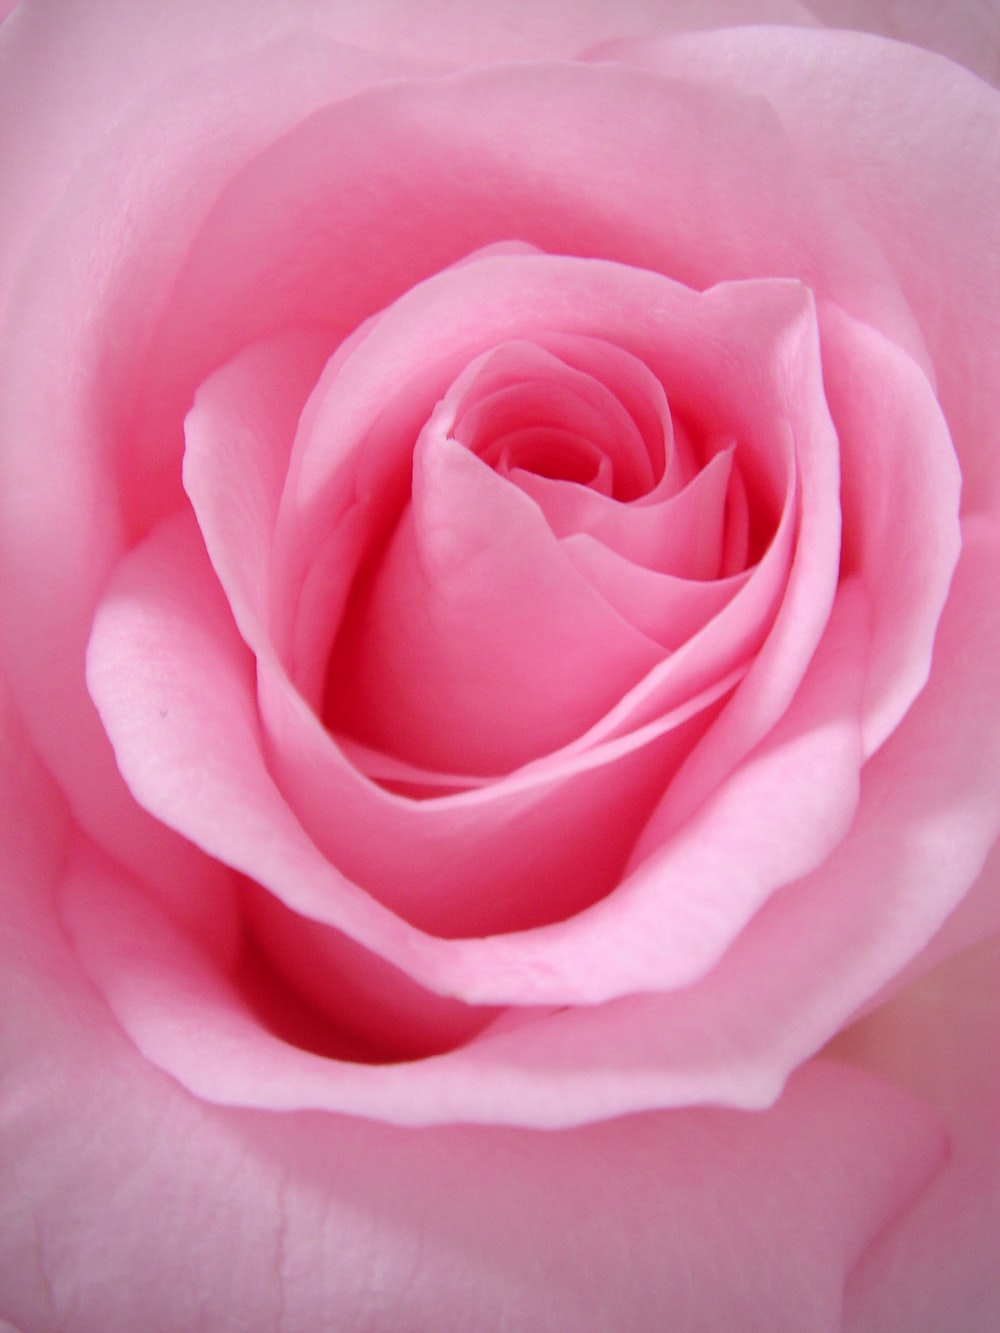 close up photo of pink rose photo – Free Flower Image on Unsplash